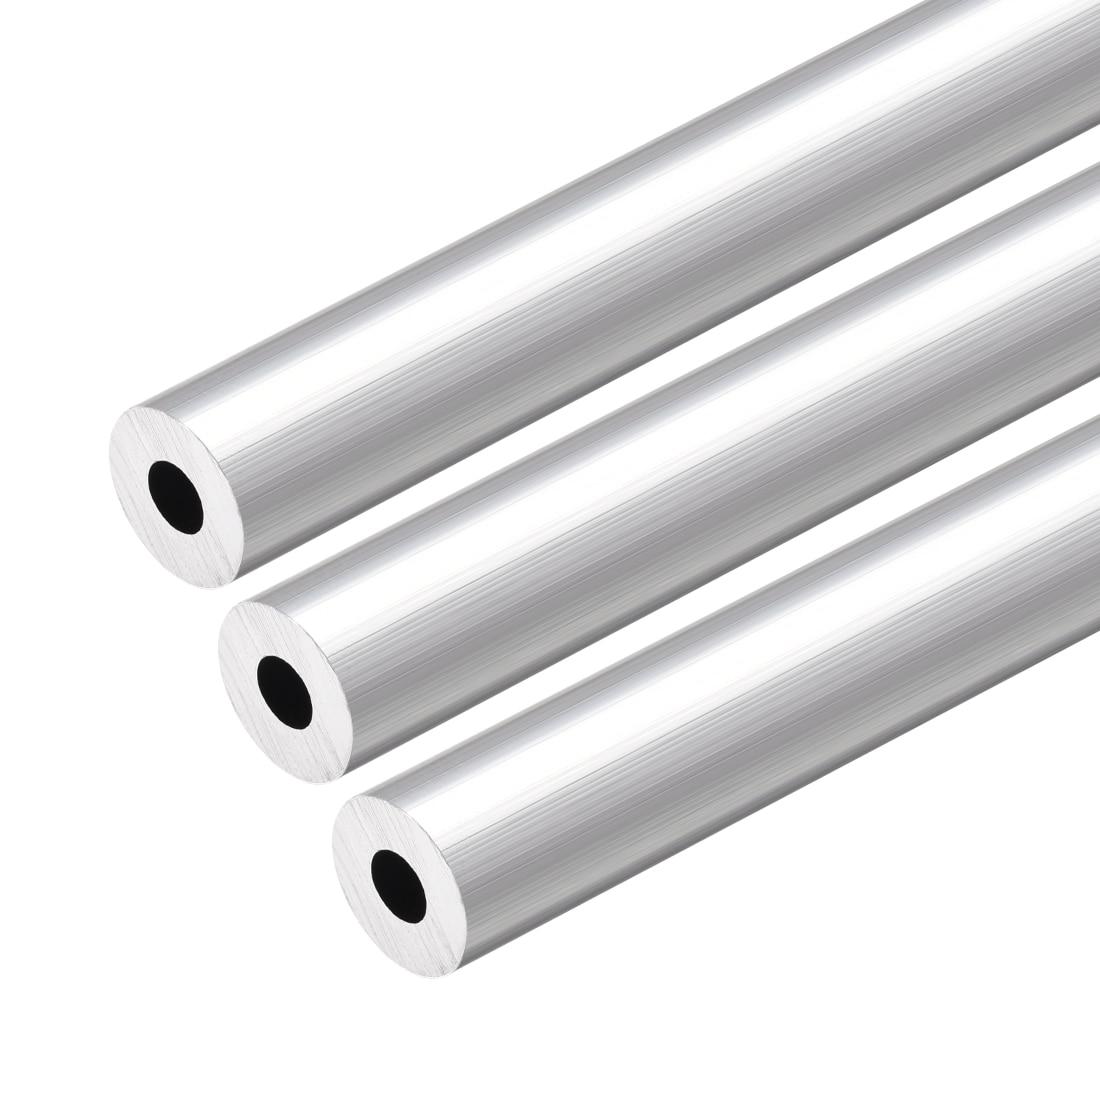 Uxcell 6063 Aluminum Round Tube 300mm Length 12mm OD 5mm Inner Dia Seamless Aluminum Straight Tubing 3 Pcs